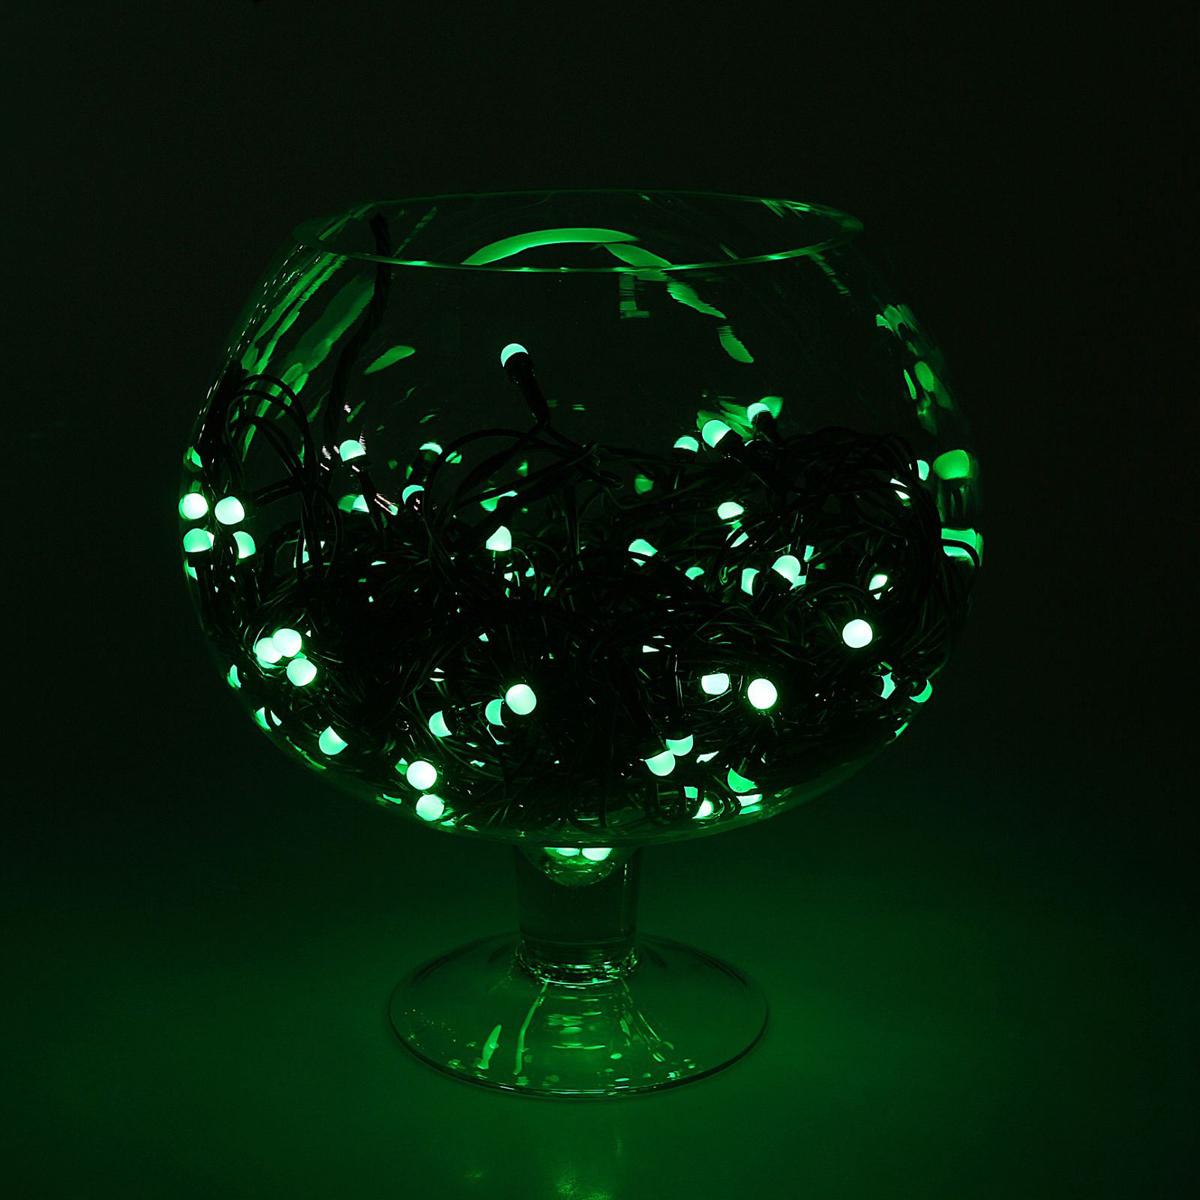 Гирлянда Luazon Метраж, длина 20 м, LED 200 ламп, 220V, цвет: зеленый гирлянда luazon метраж цветы 5m led 20 220v 185506